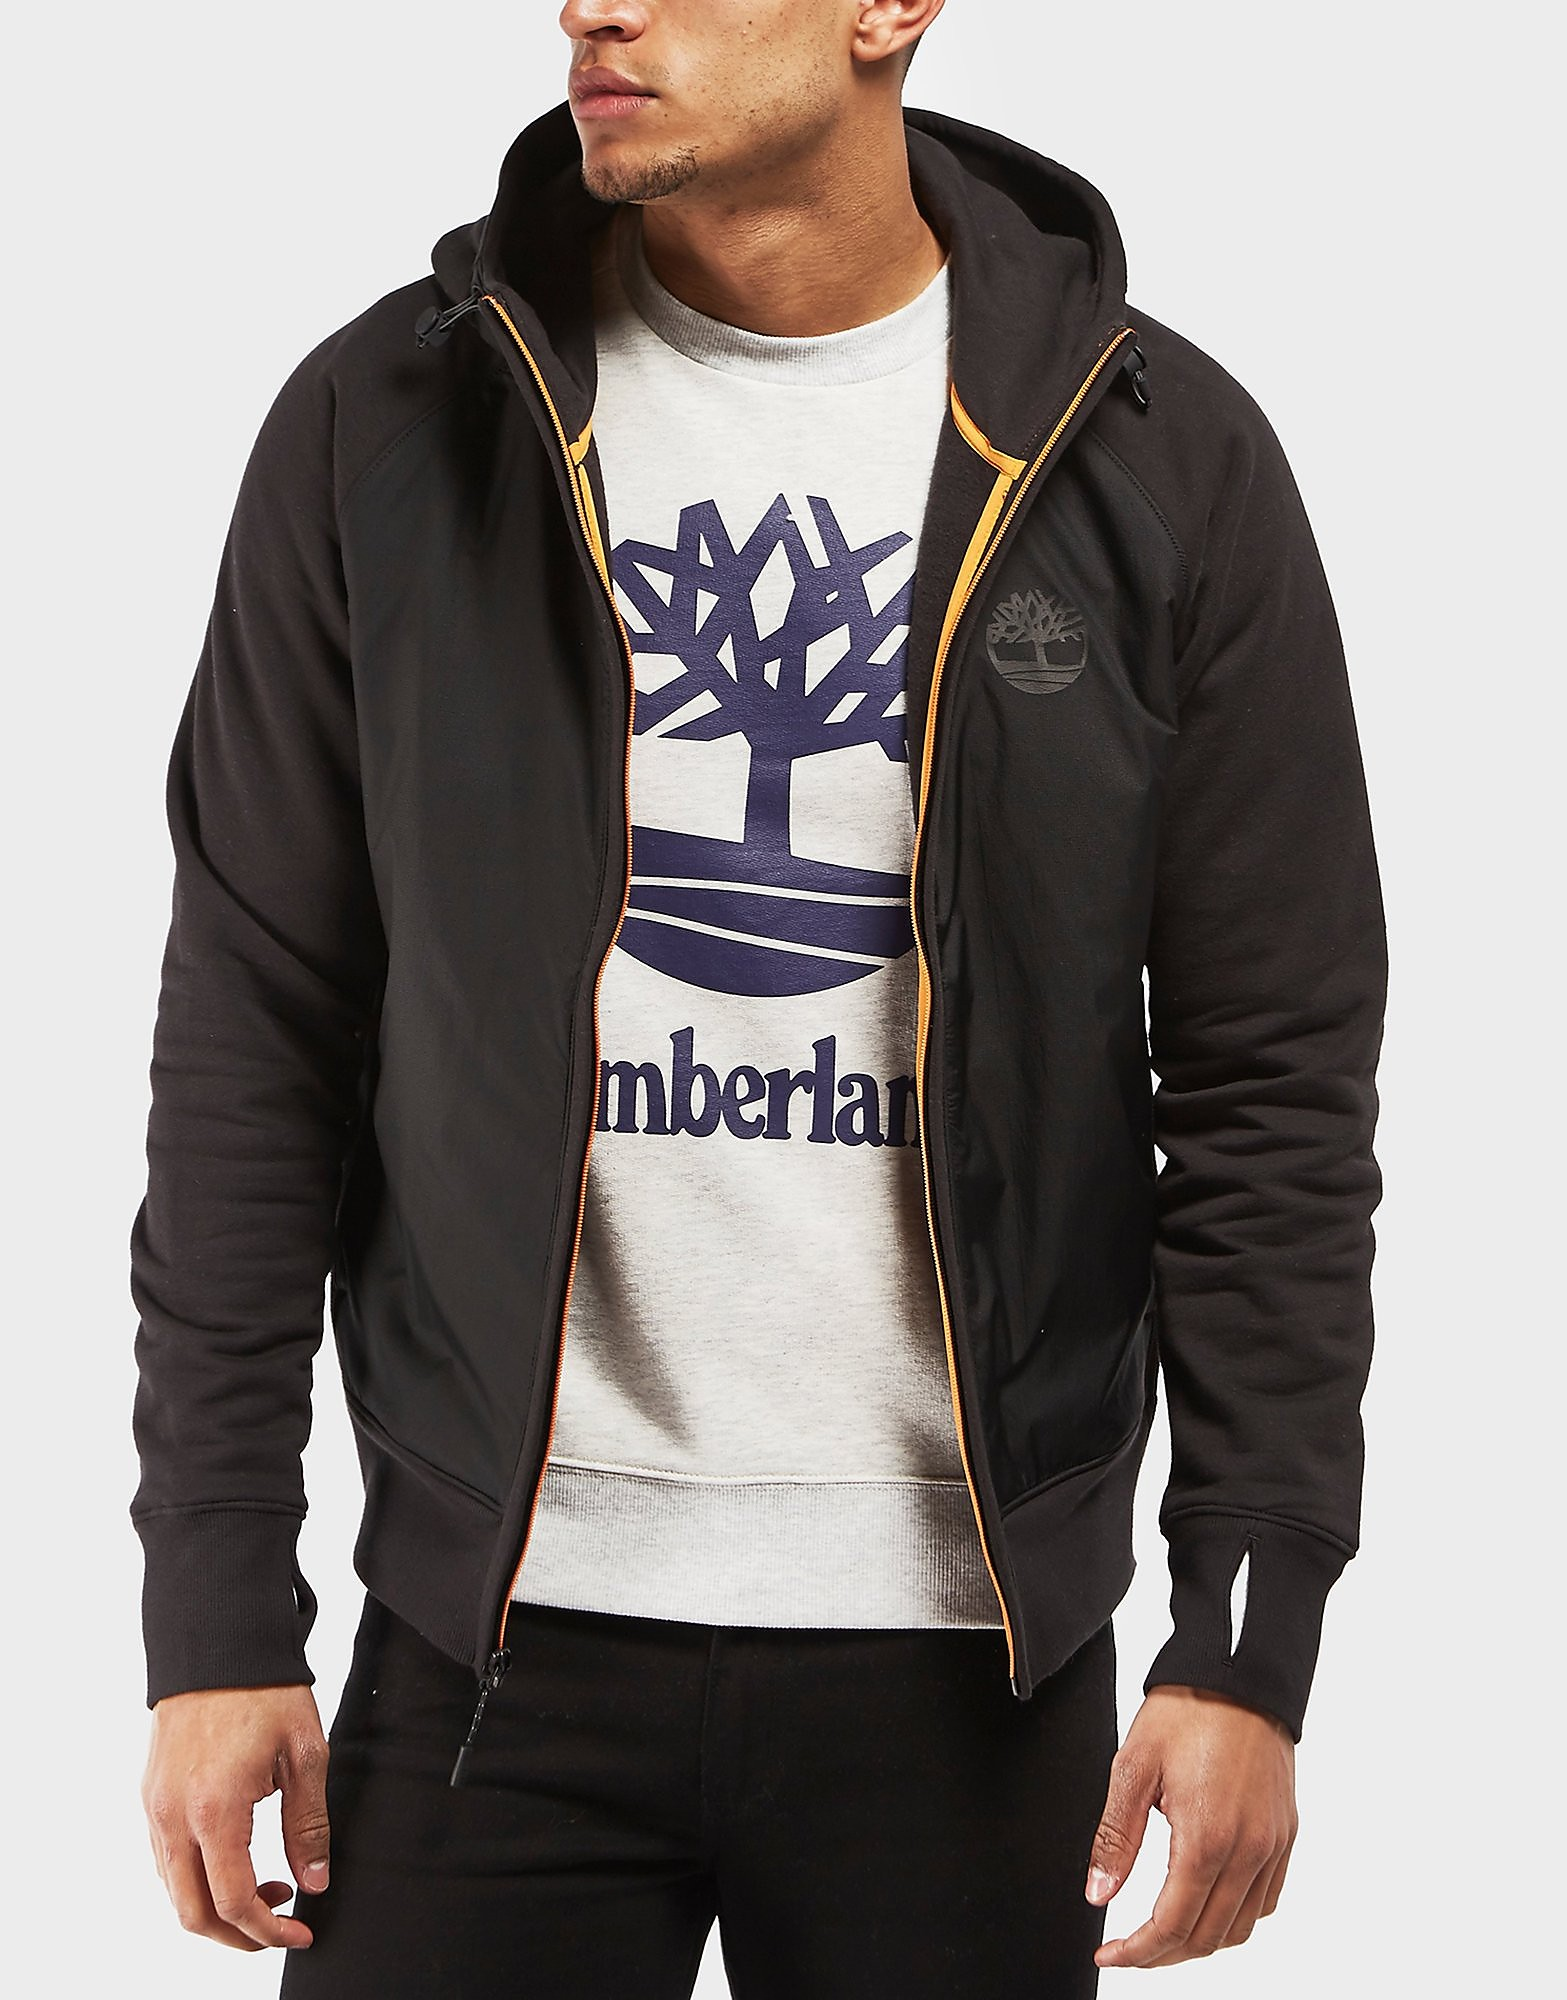 Timberland Hybrid Full Zip Hoodie